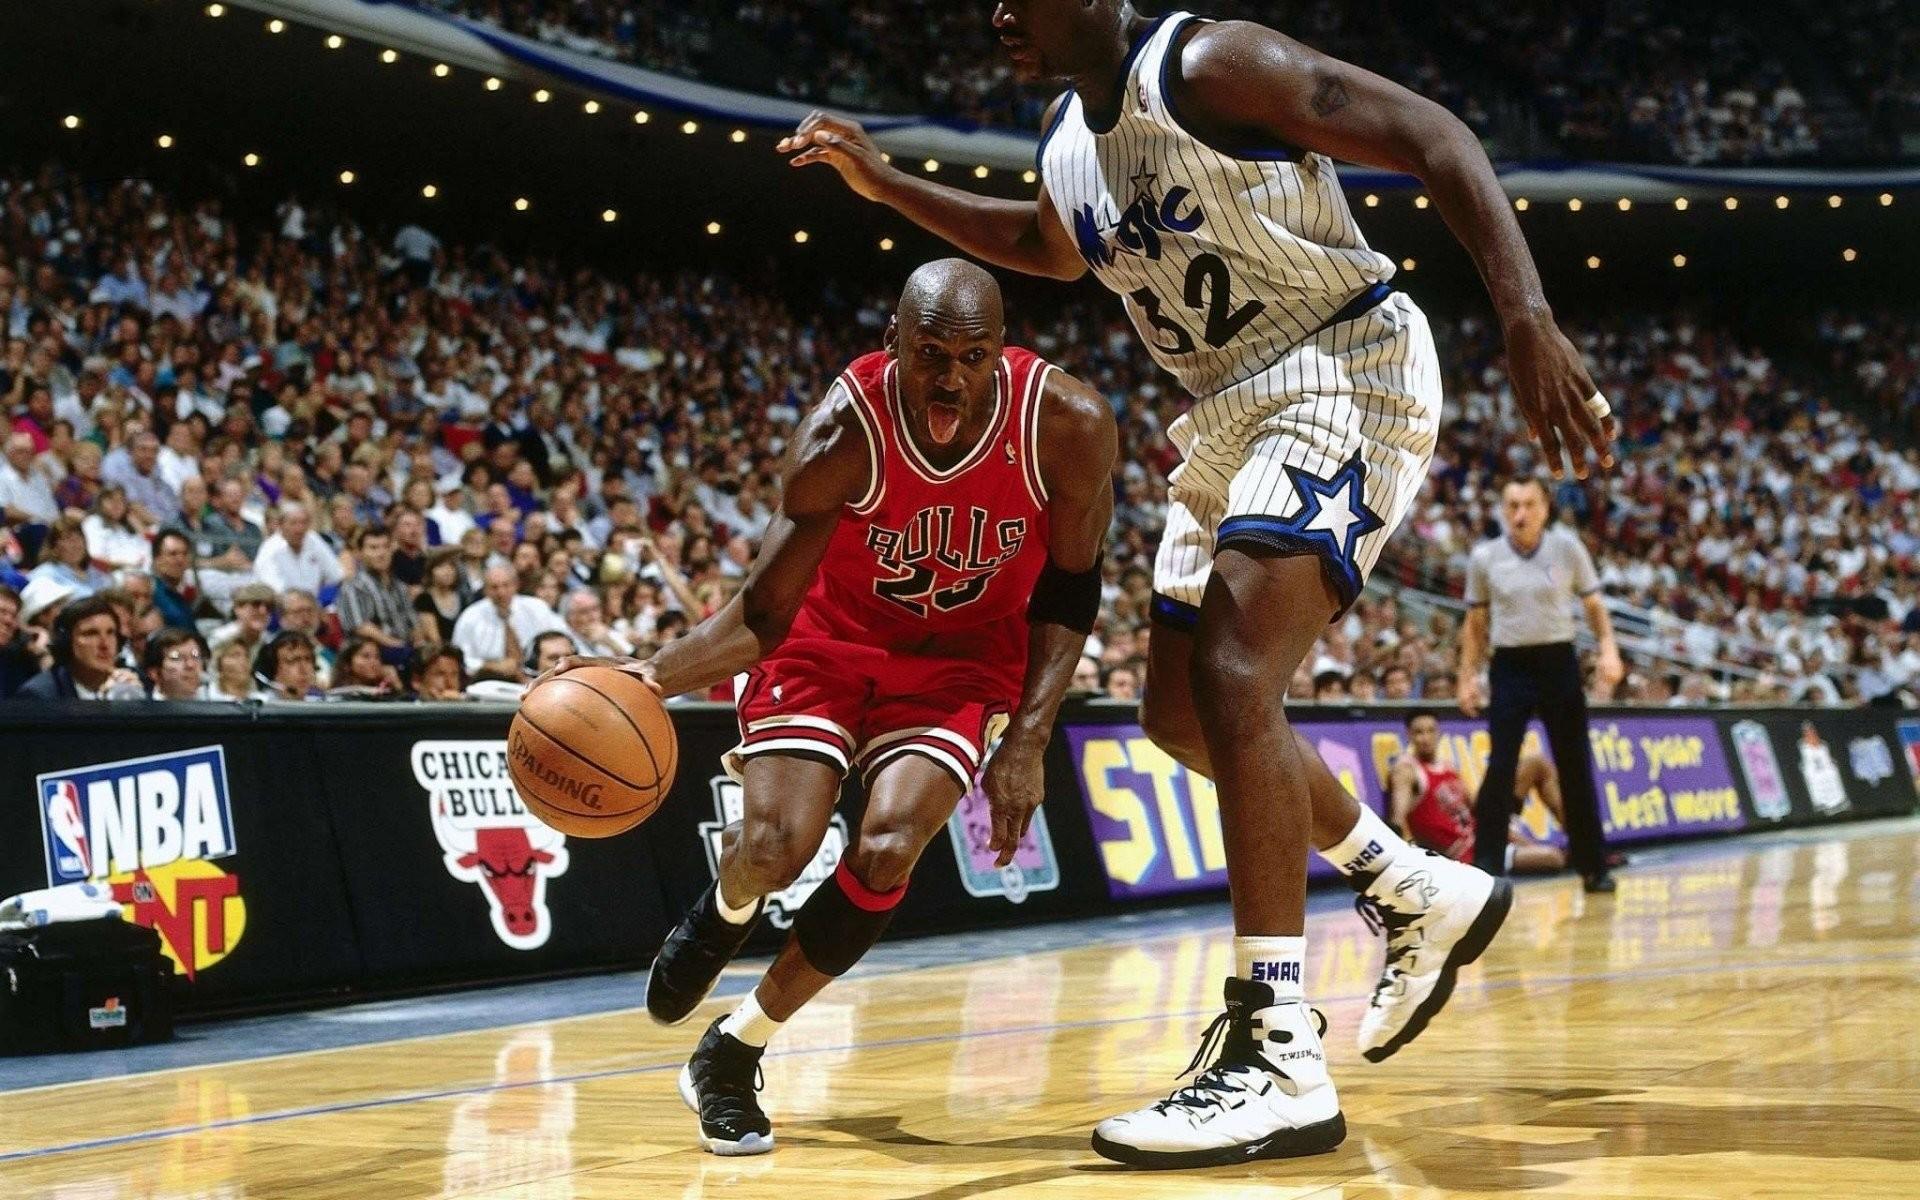 Chicago Bulls Magic Nba Basketball Sports Jordan Orlando Shaquille Oneal Michael Wallpaper Wallpapers